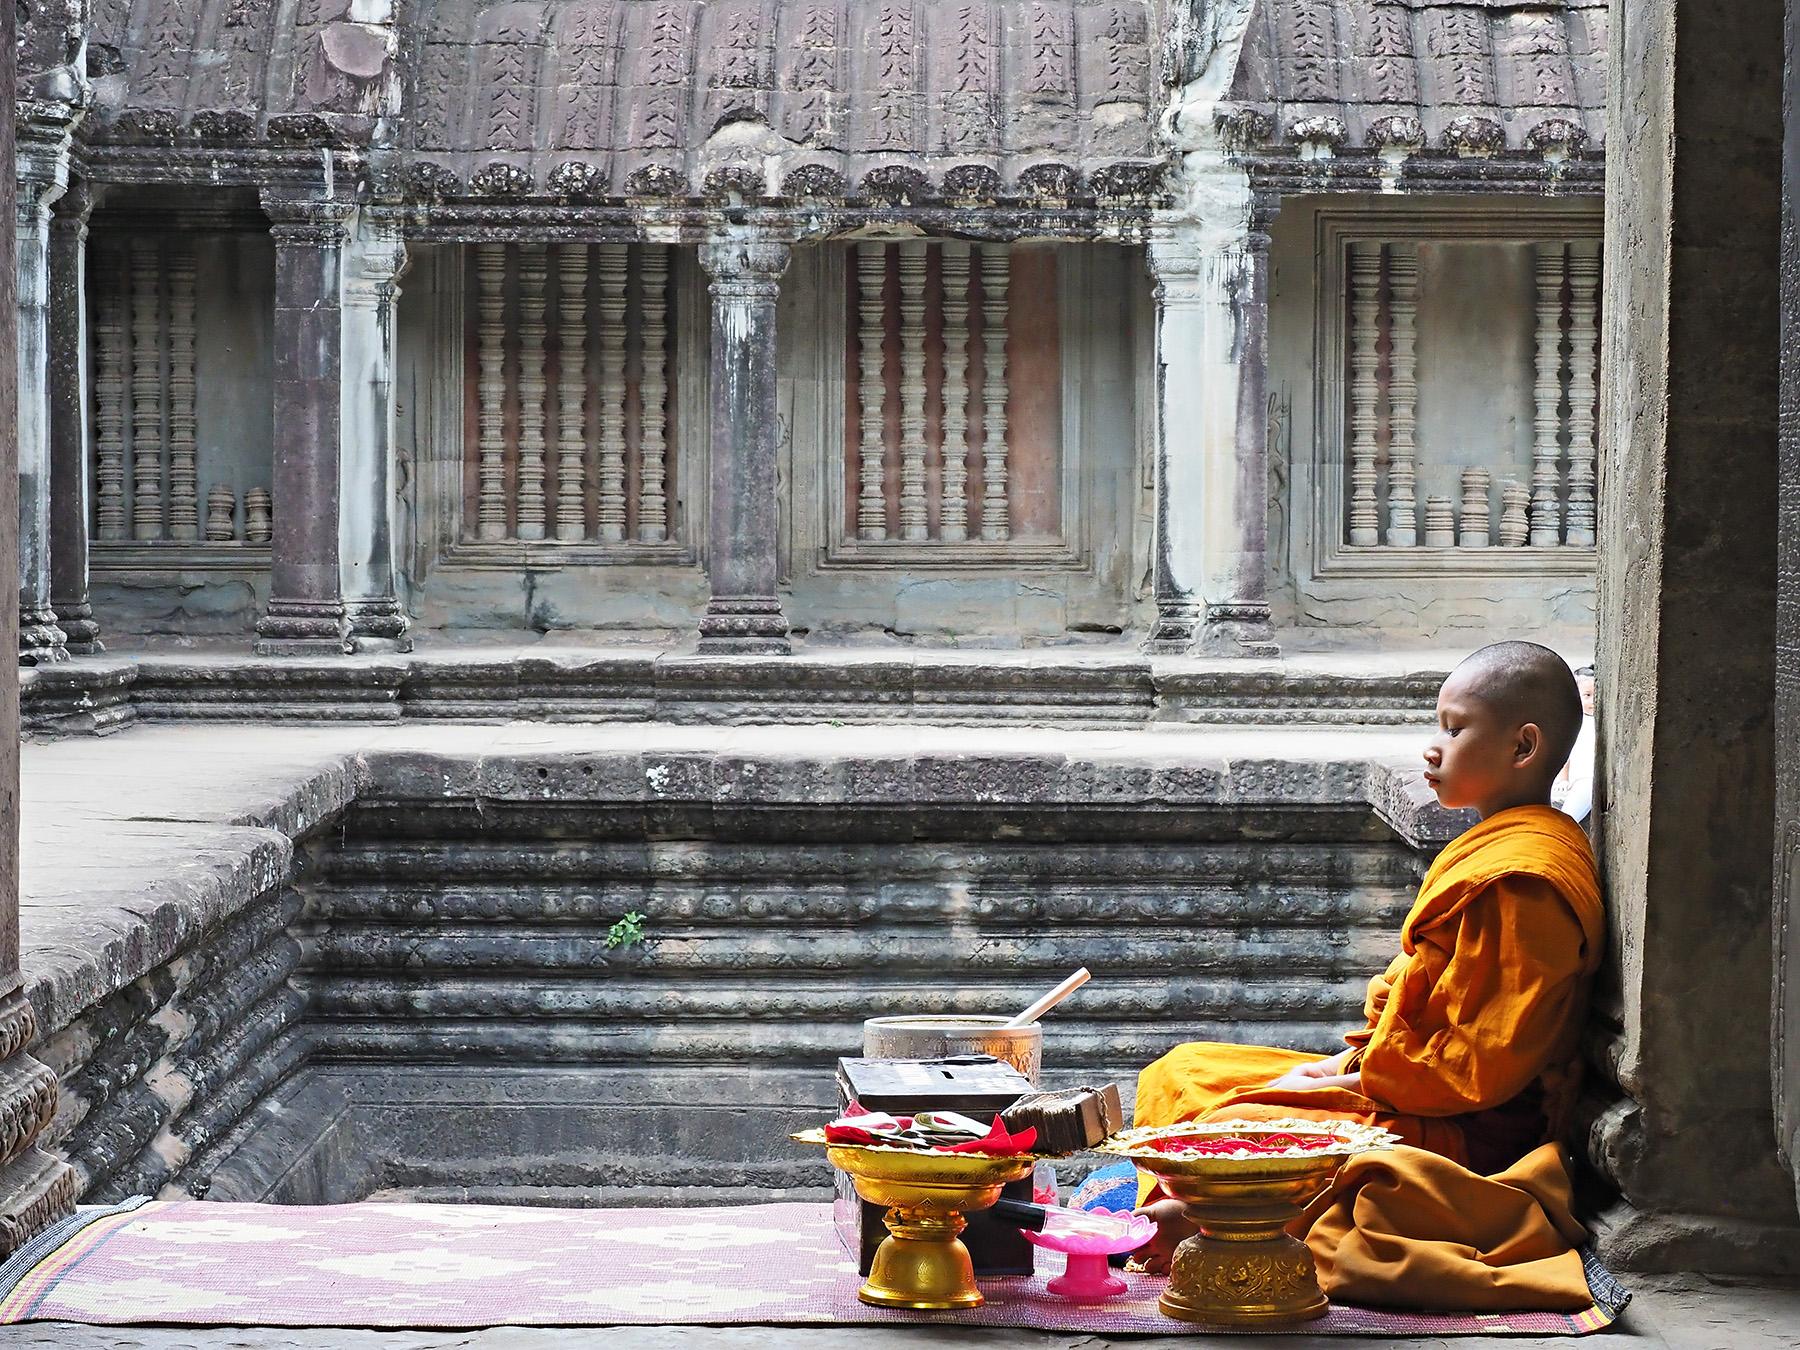 Ranjan-ramchandani_A novice monk at Angkorvat.jpg